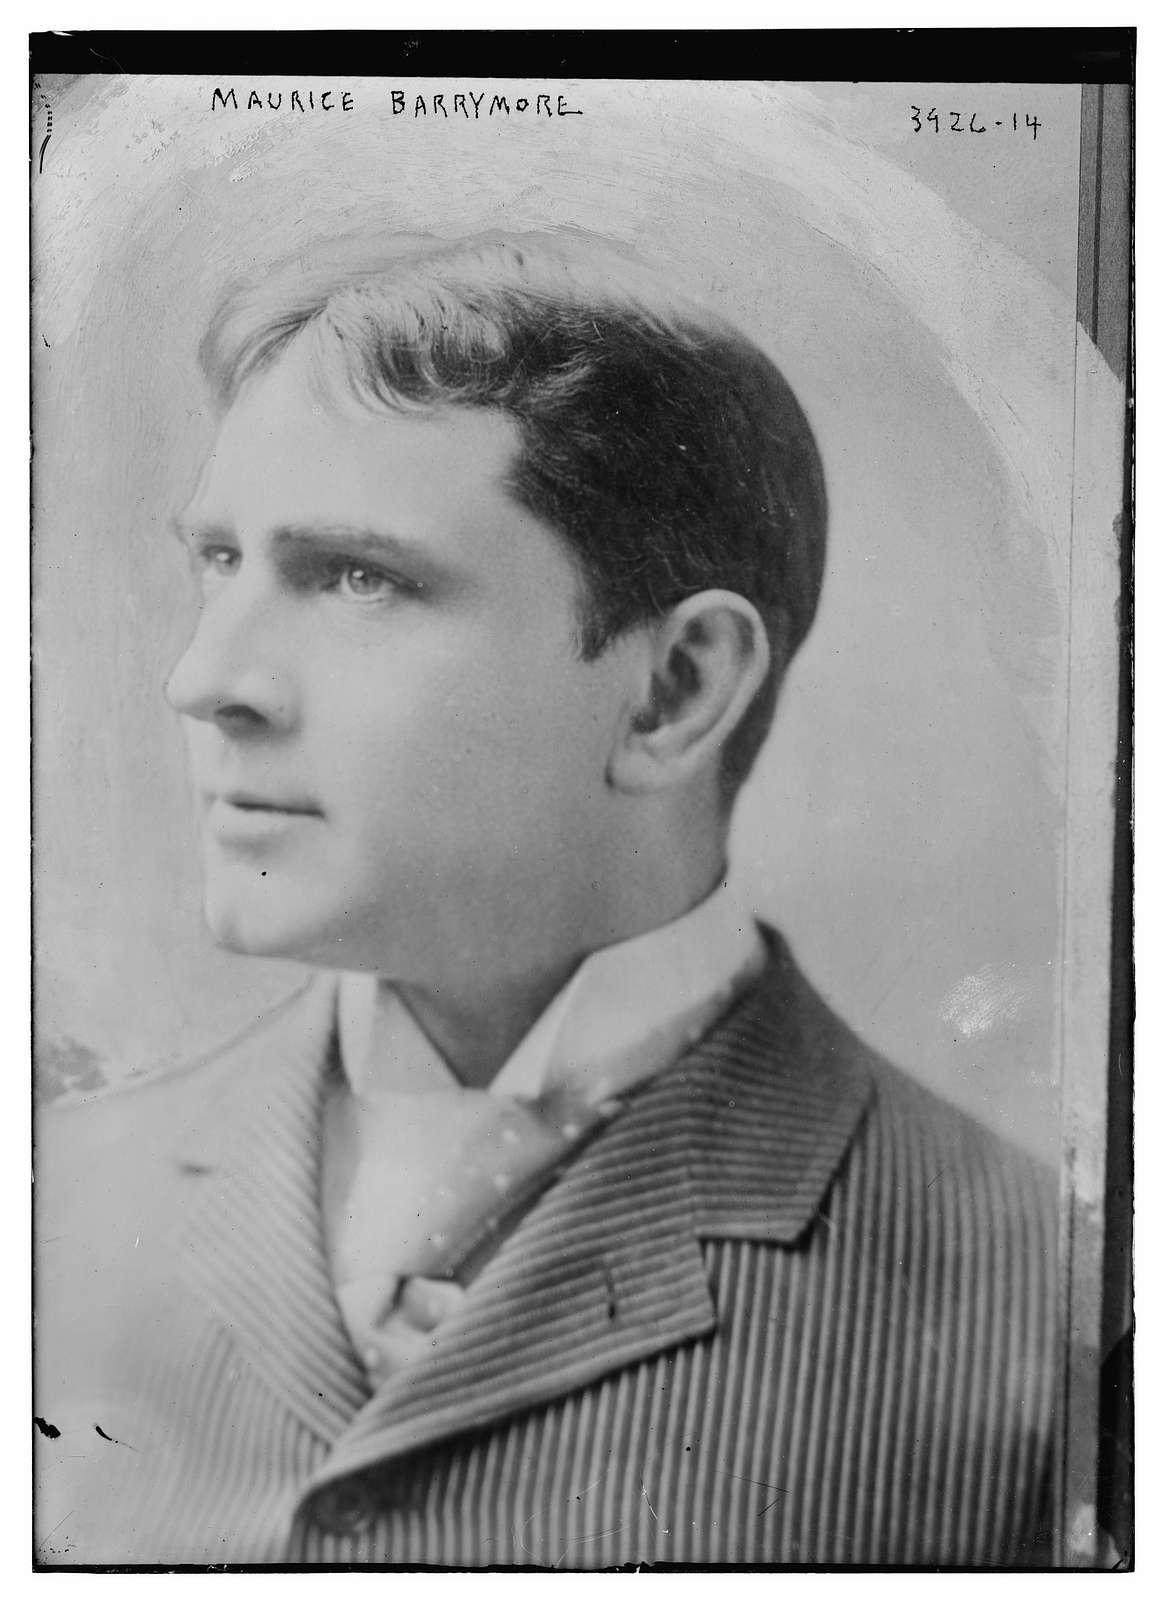 Maurice Barrymore